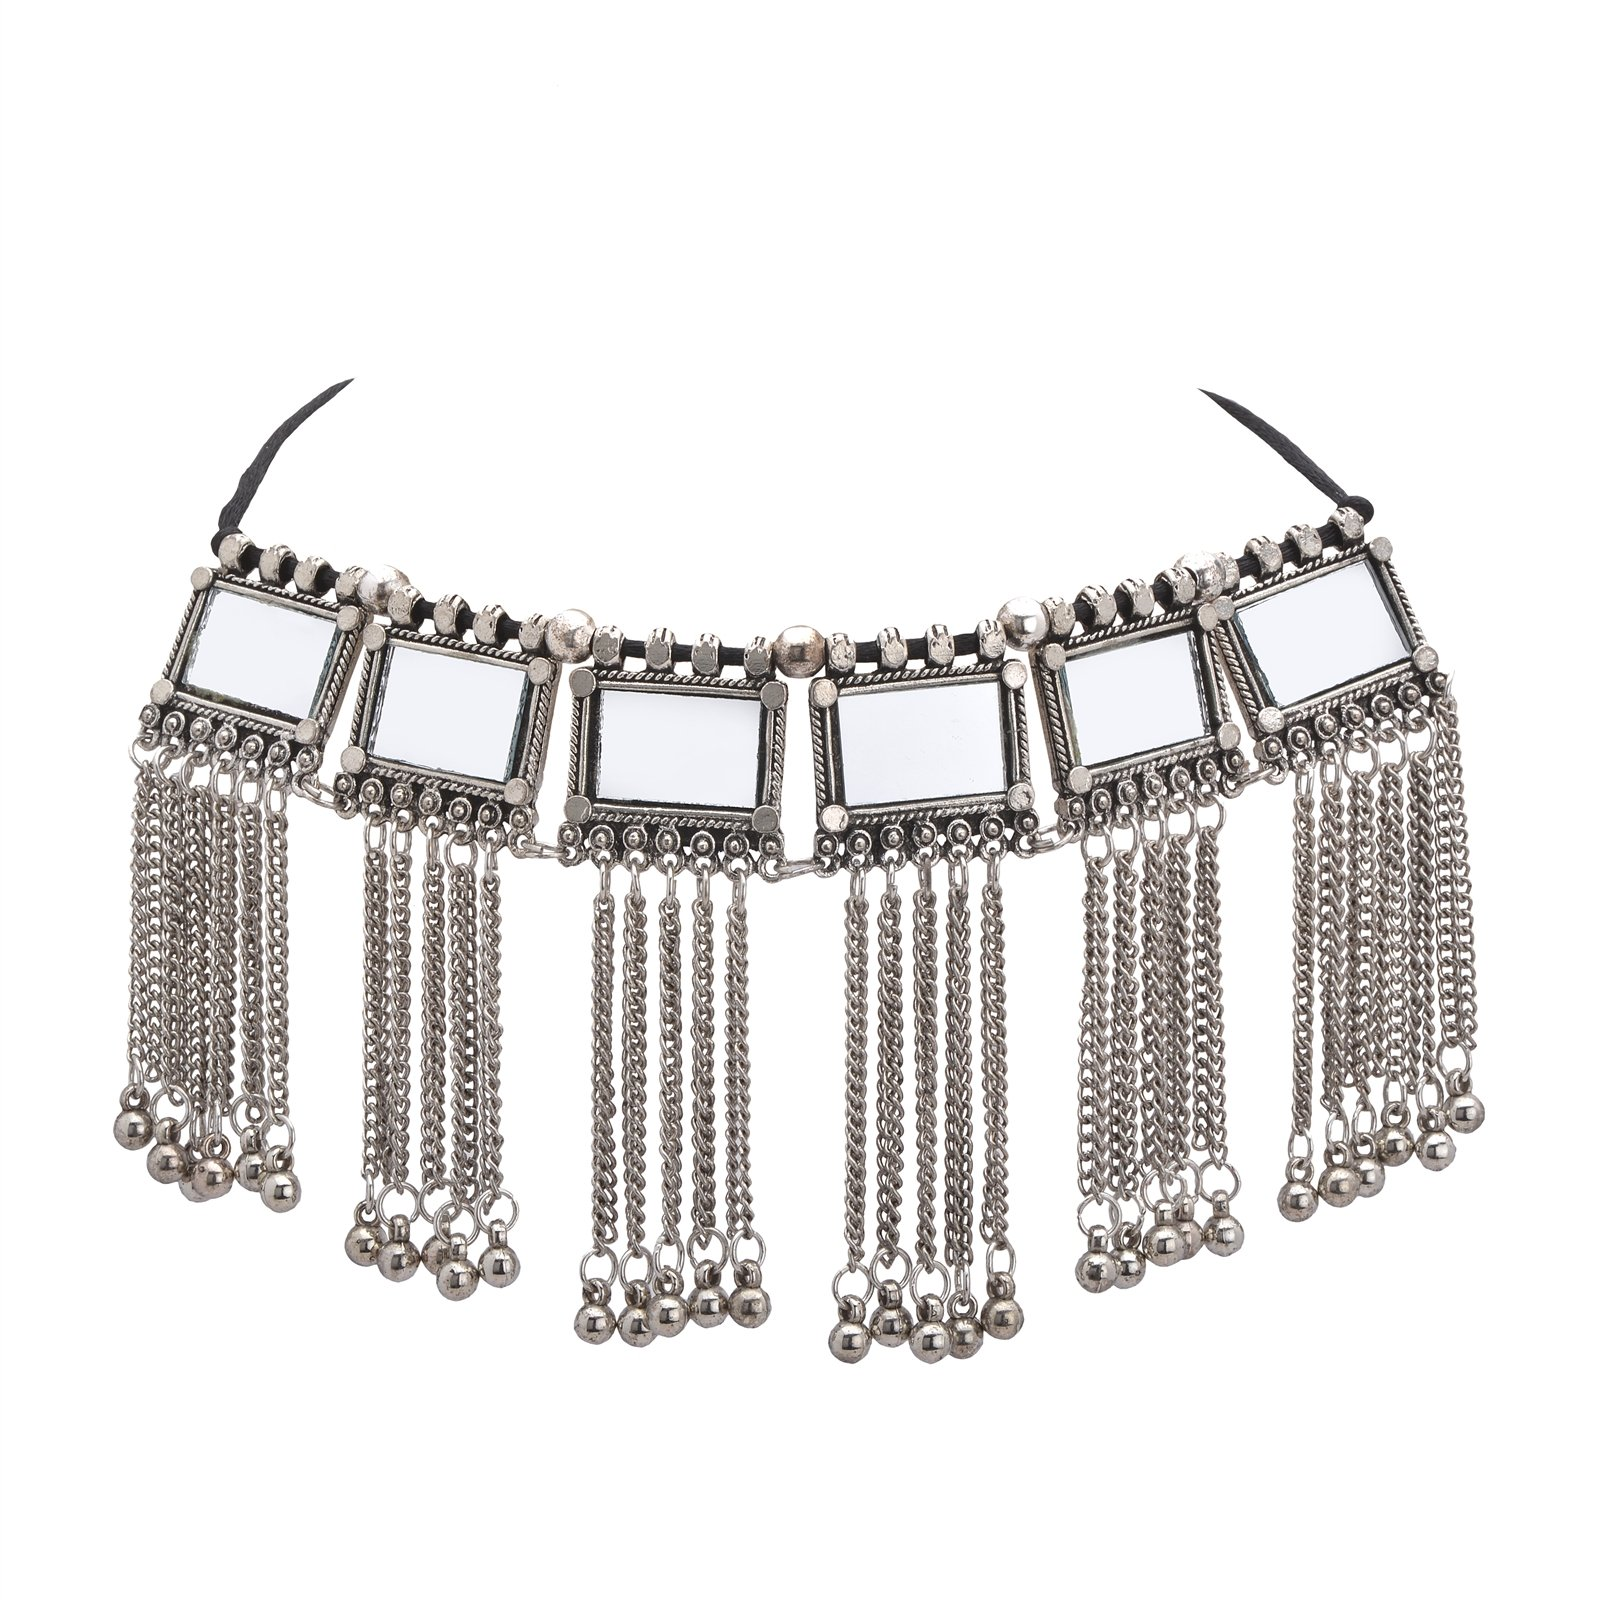 Oreleaa Necklace Choker Boho Style Mirror Oxidized Silver Trendy Tassel Pendant for Girls and Women